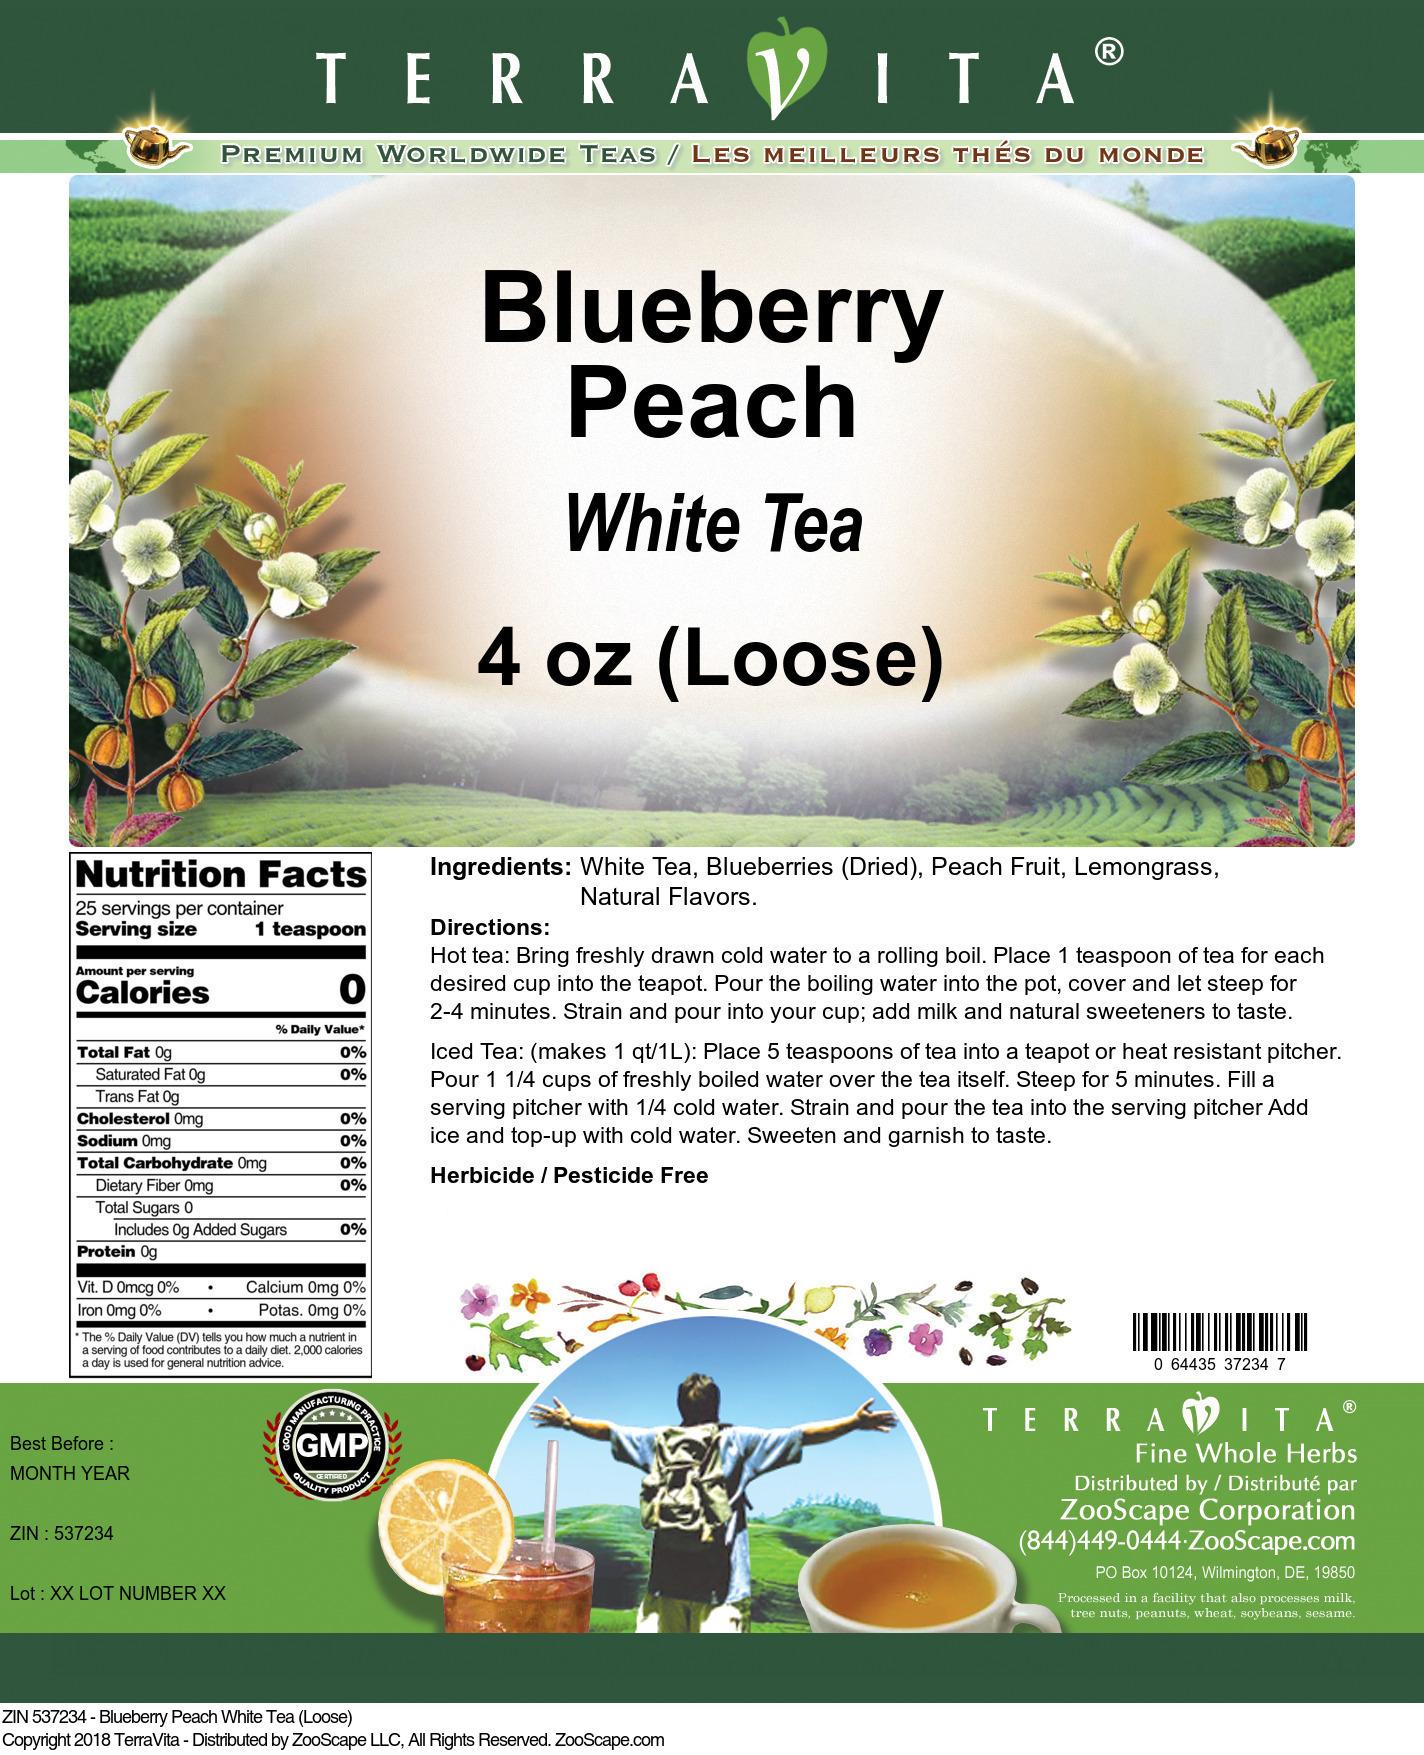 Blueberry Peach White Tea (Loose)